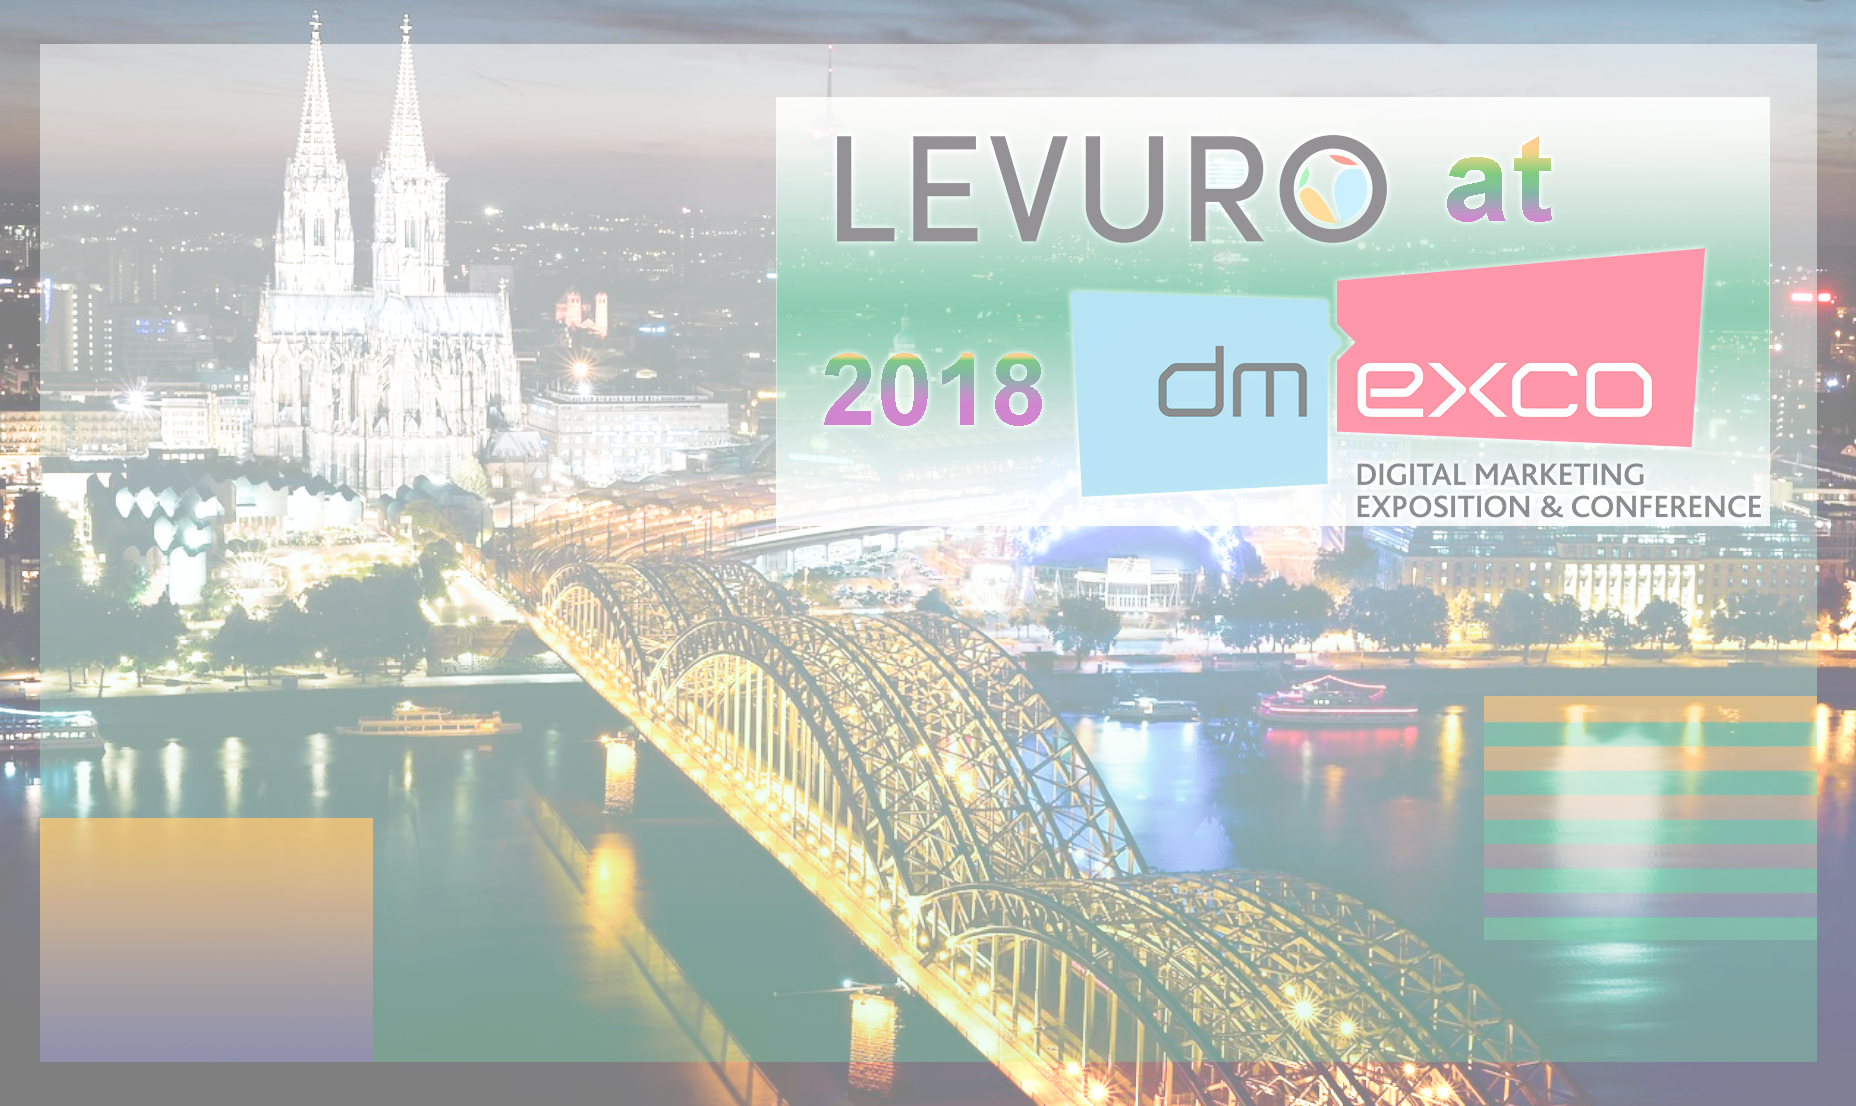 Meet LEVURO at DMEXCO 2018